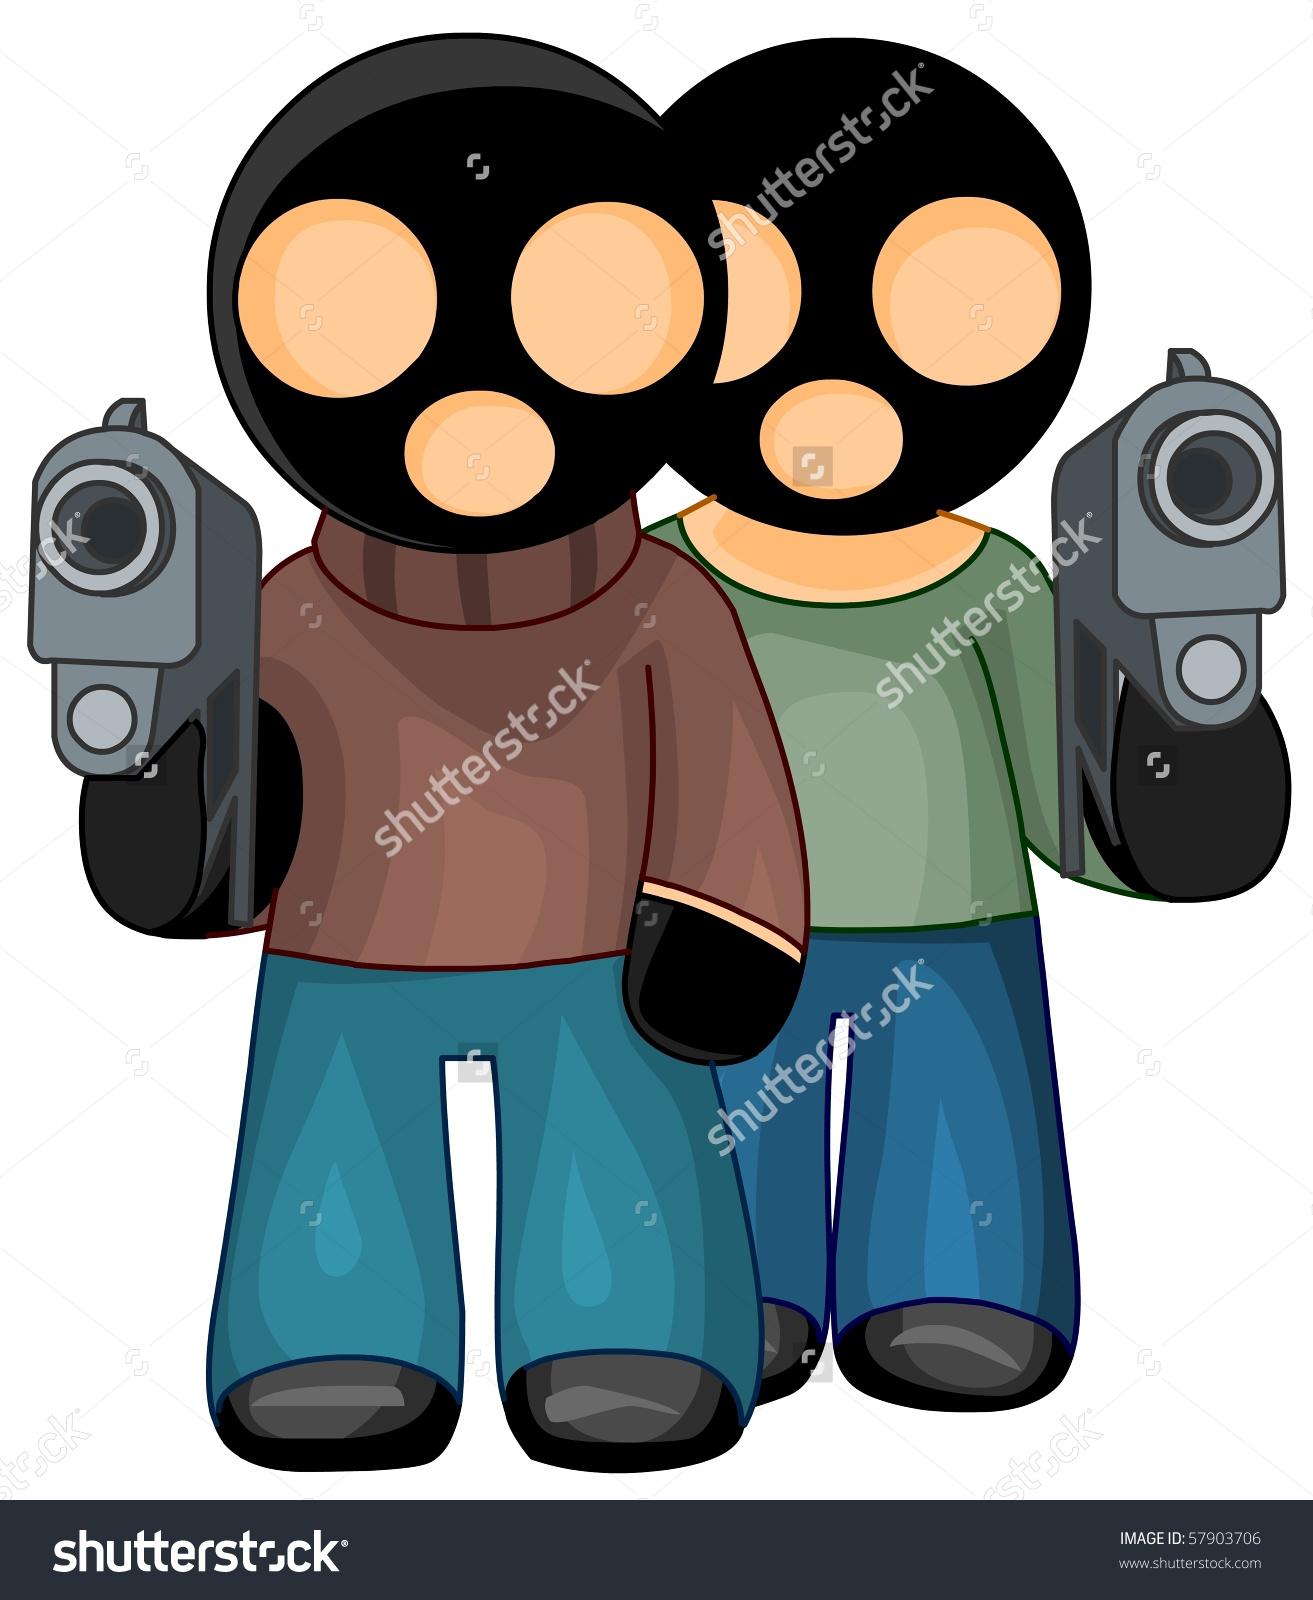 Criminals Black Masks Guns Isolated Stock Illustration 57903706.